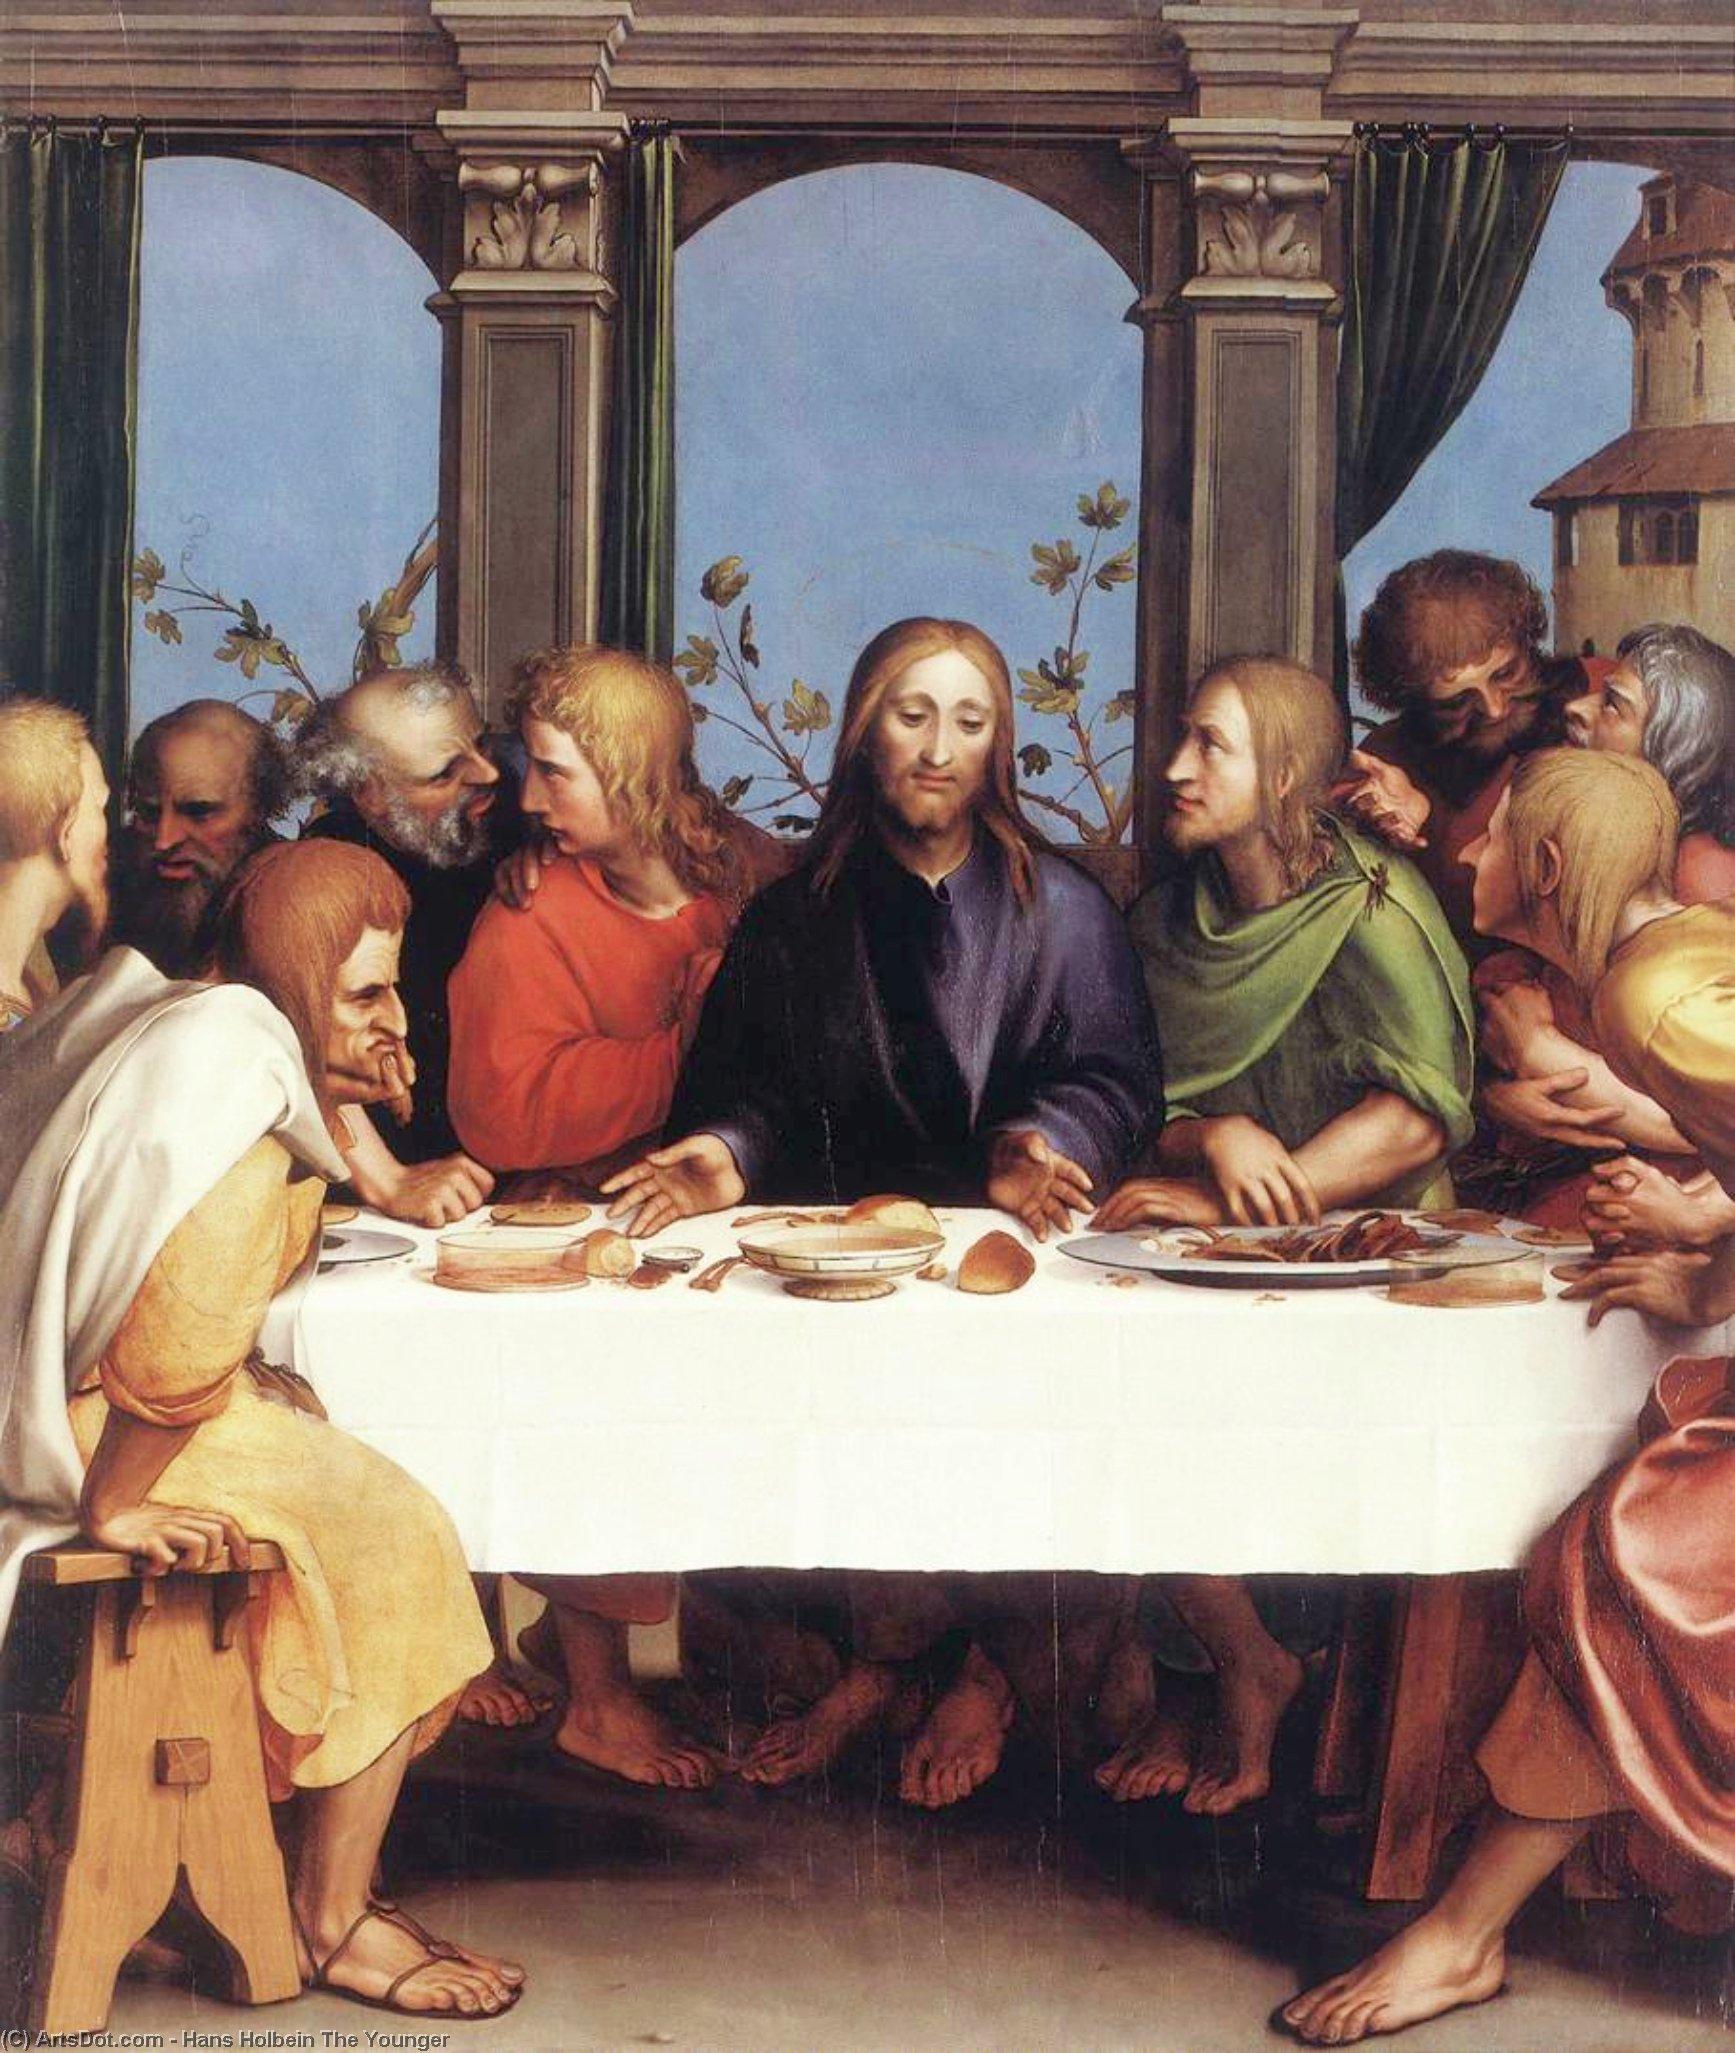 WikiOO.org - Enciclopedia of Fine Arts - Pictura, lucrări de artă Hans Holbein The Younger - The Last Supper